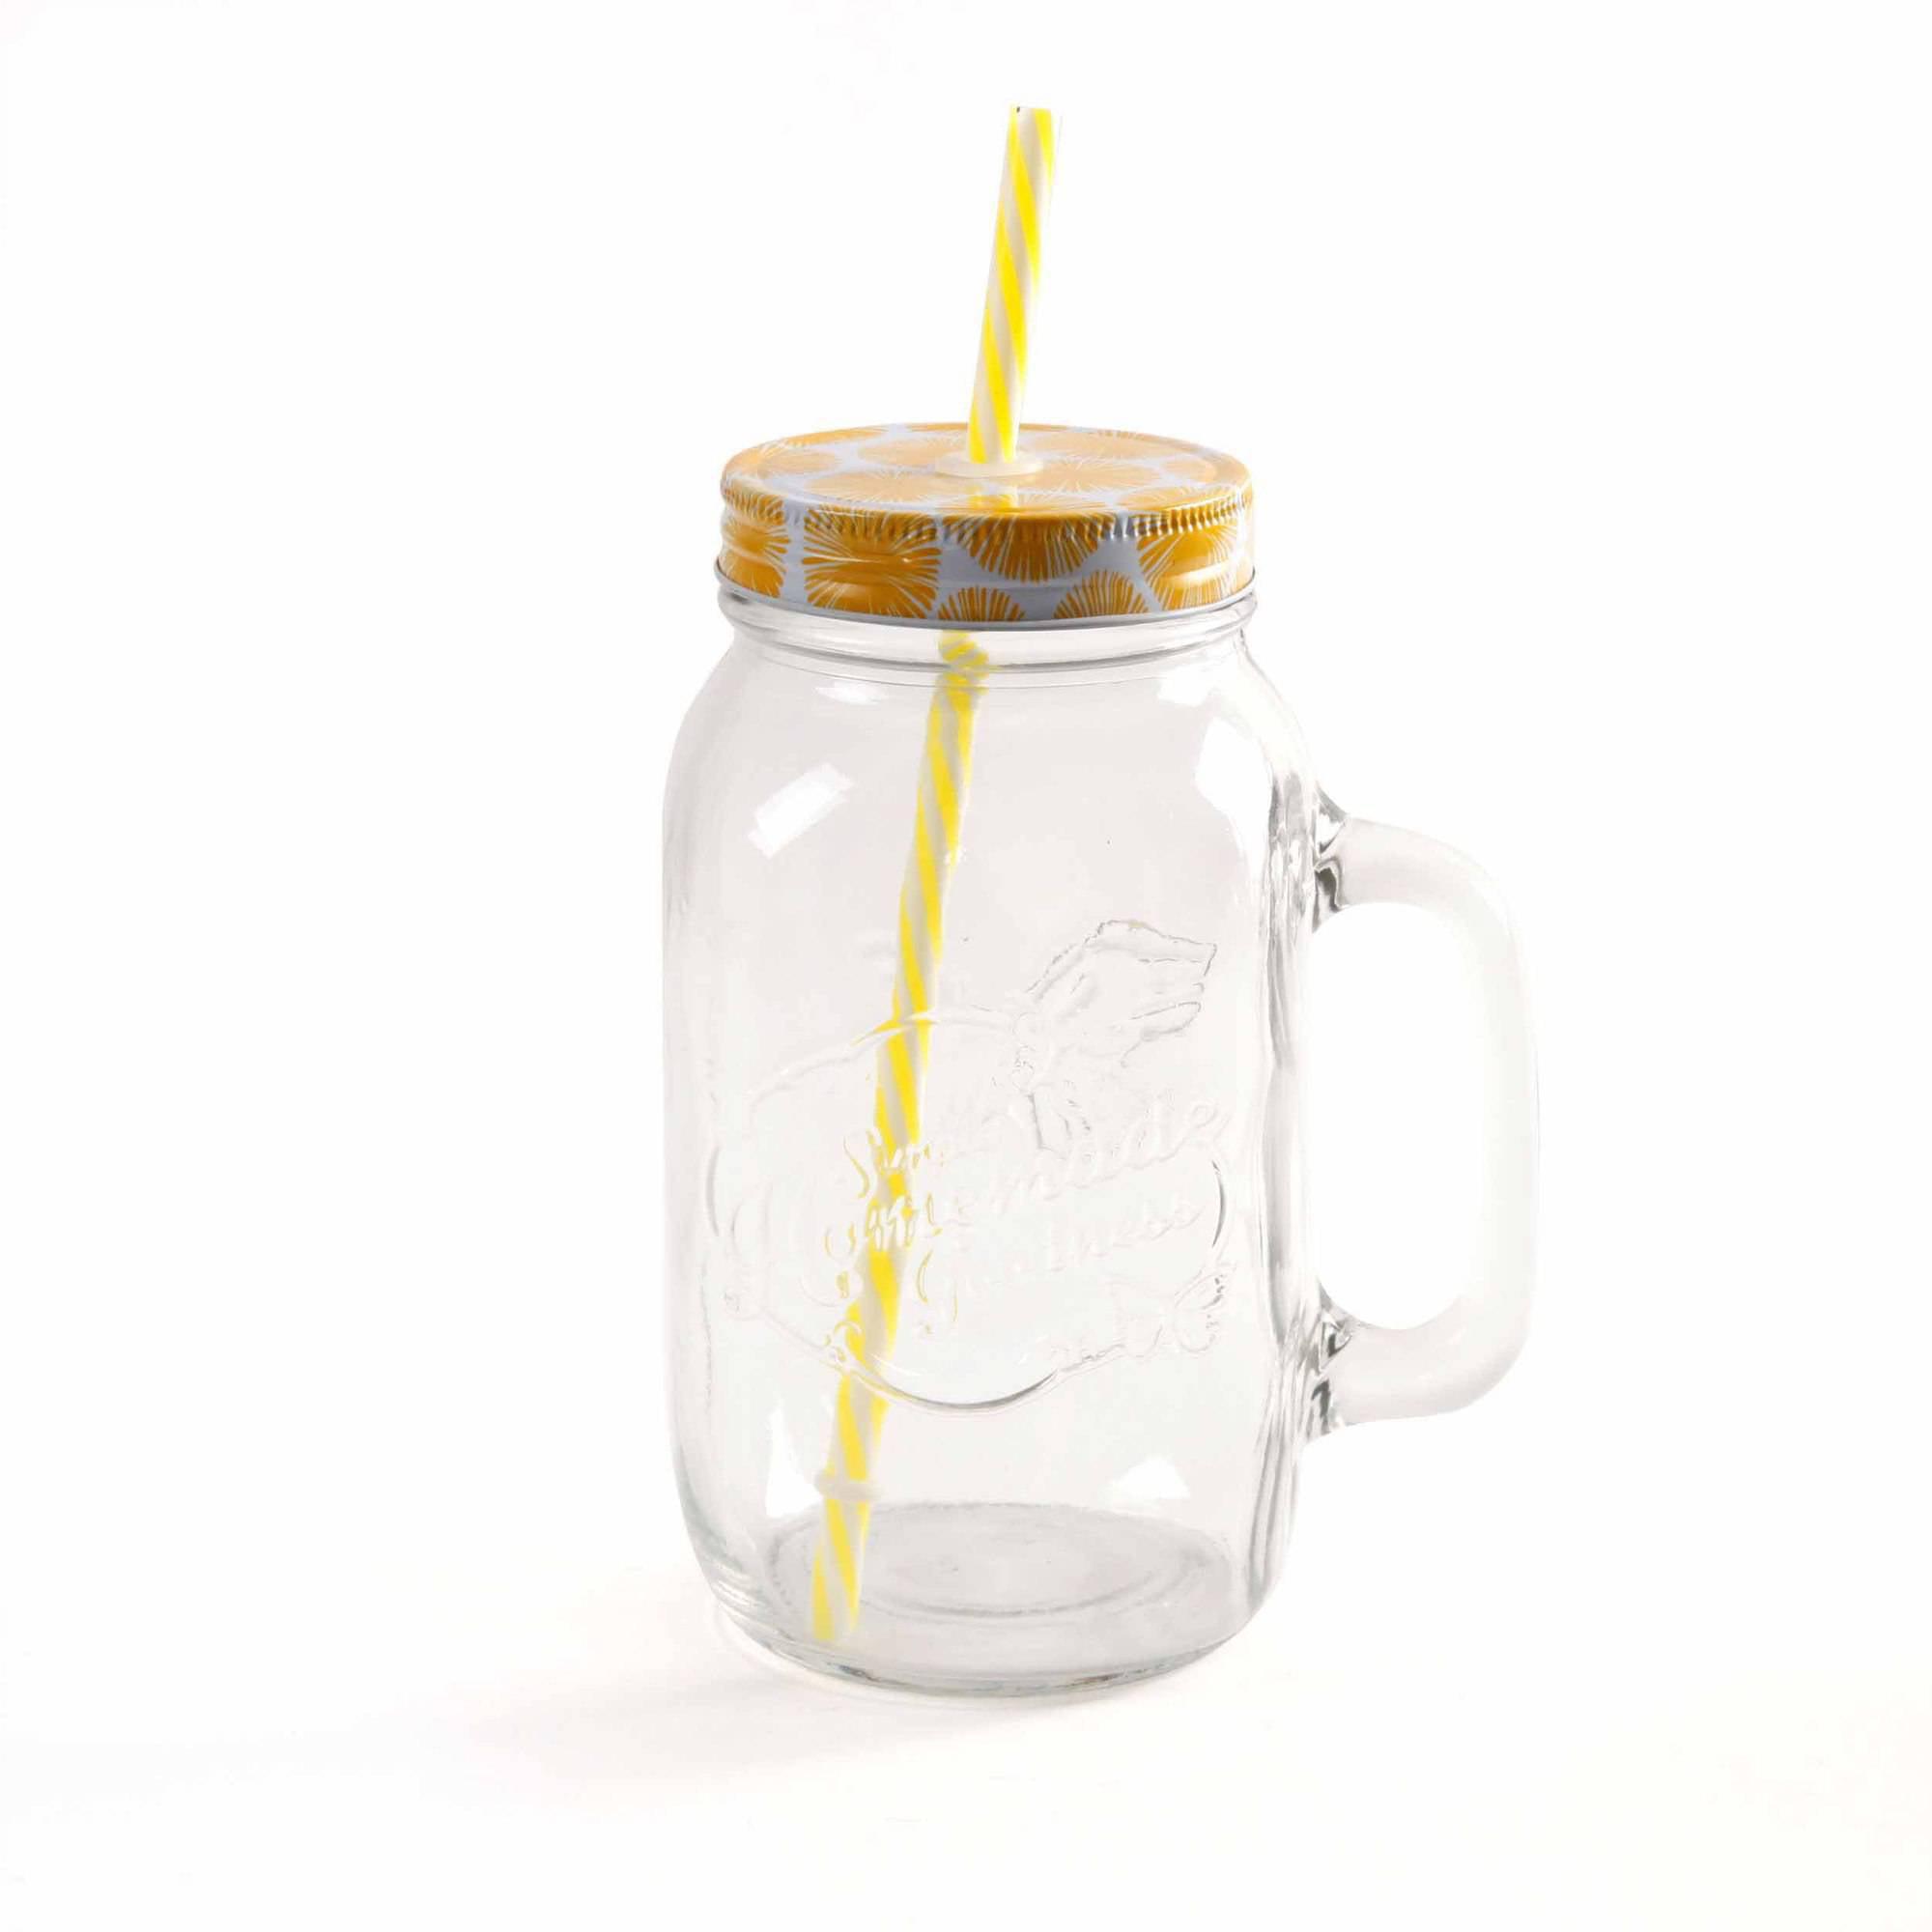 the pioneer woman simple homemade goodness 32ounce mason jars with handle lid and straw set of 4 walmartcom - Mason Jar Glasses